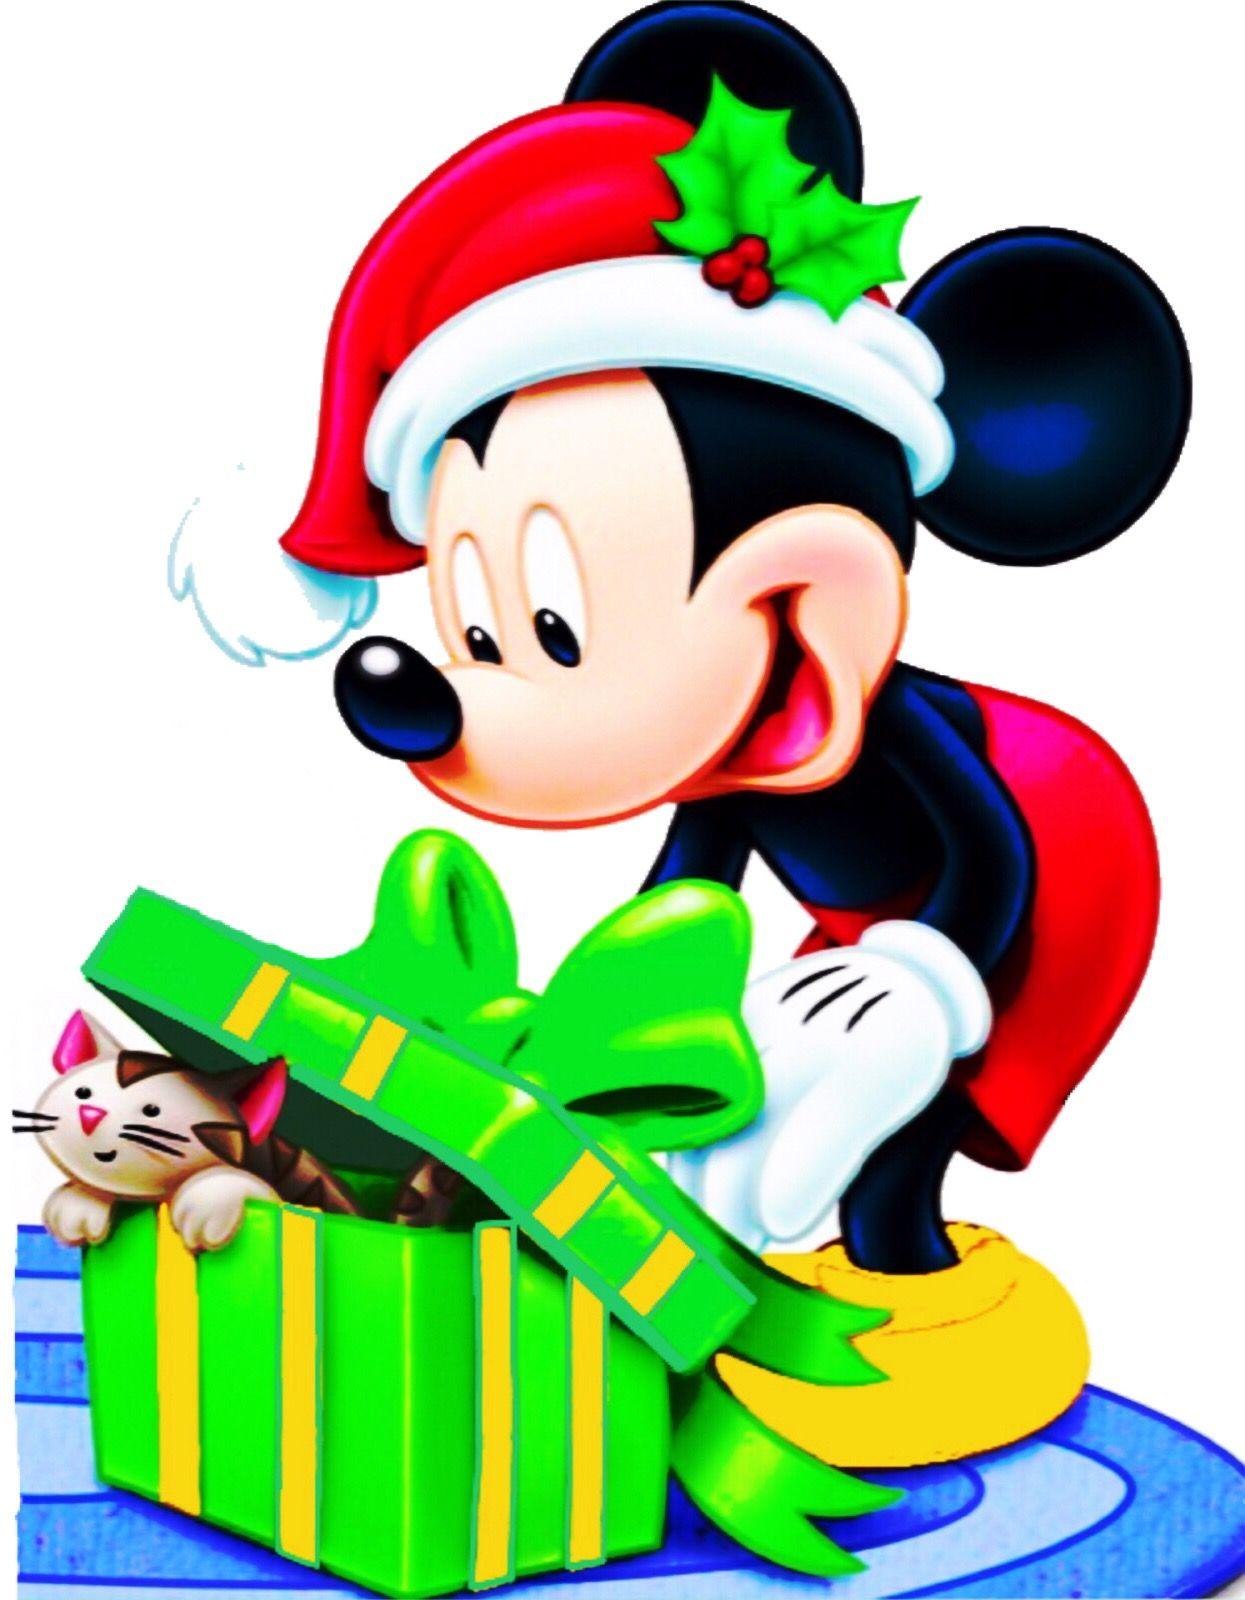 Christmas - Disney - Mickey Mouse | ❄ CHRISTMAS - DISNEY ...